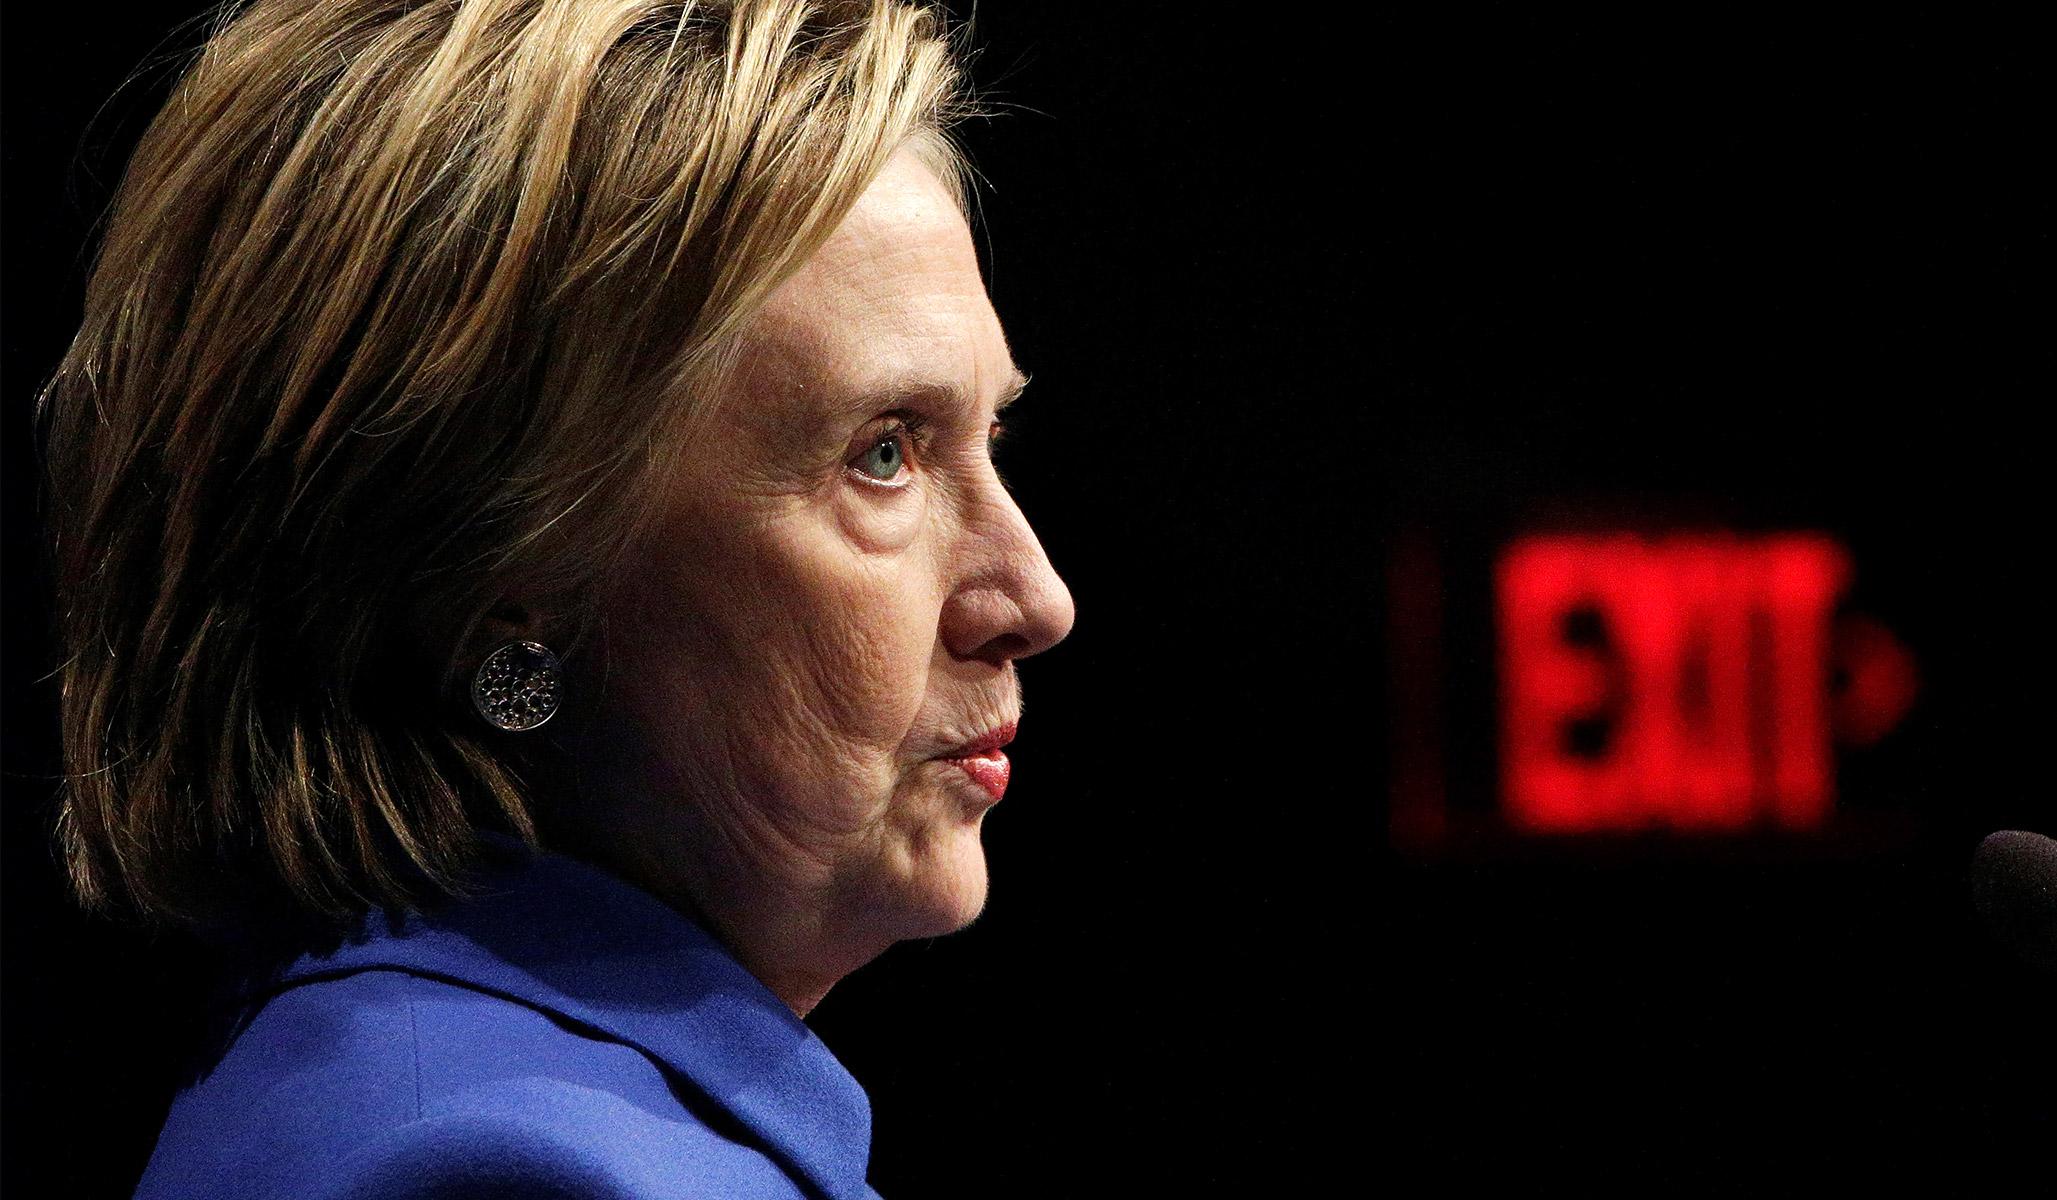 Burns Strider & Hillary Clinton Show Democrats' #MeToo ...